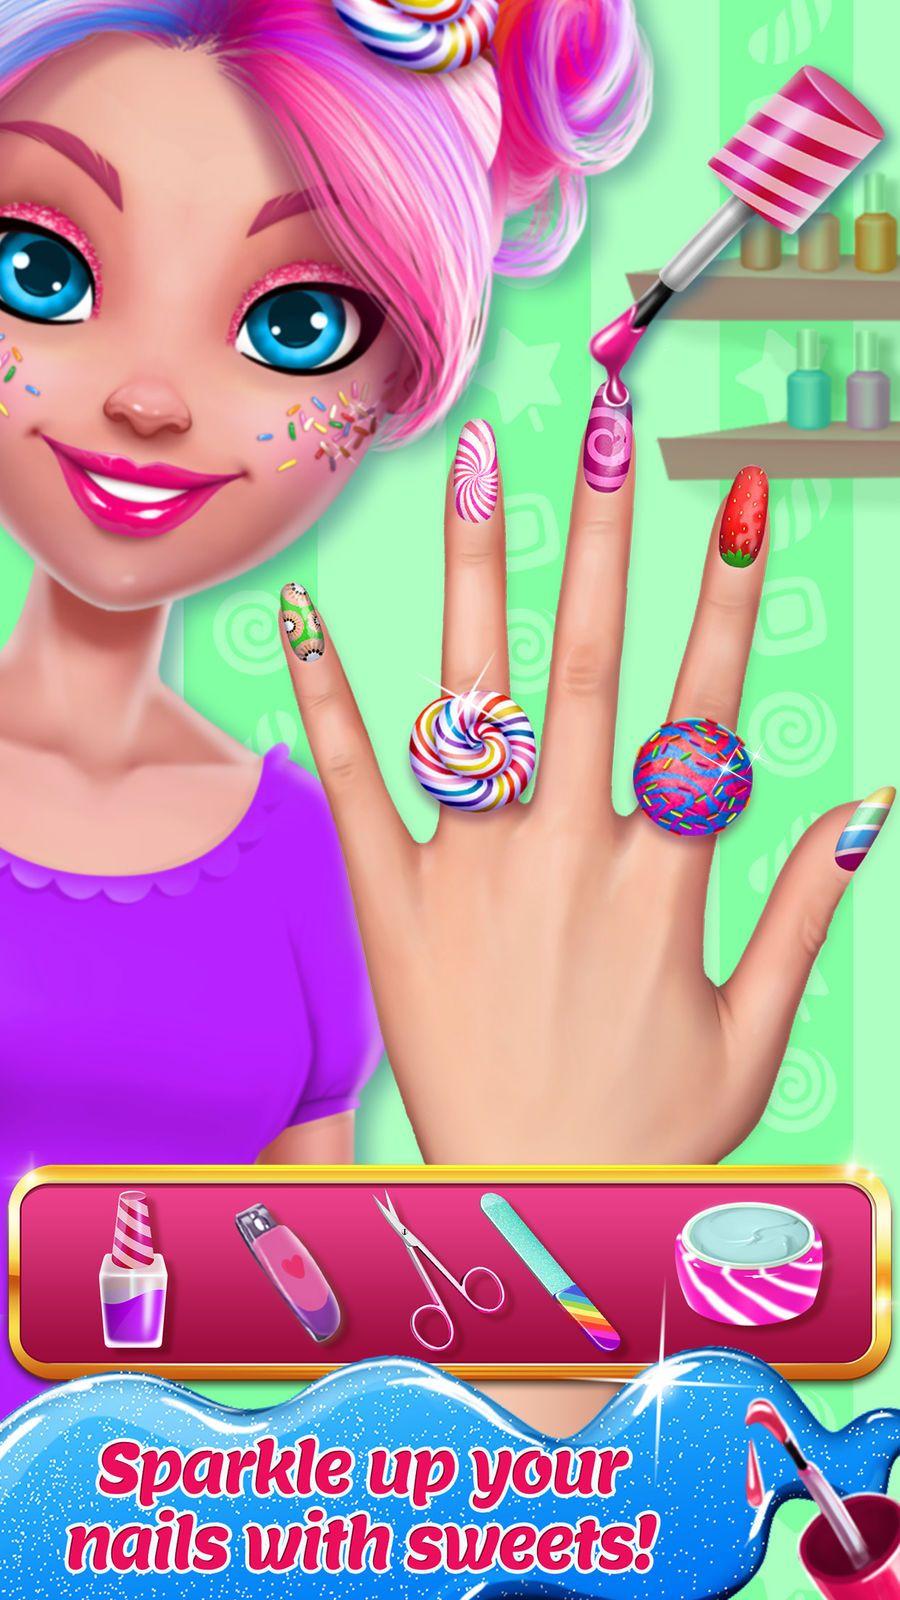 Candy makeup beauty game familygamesroleentertainment